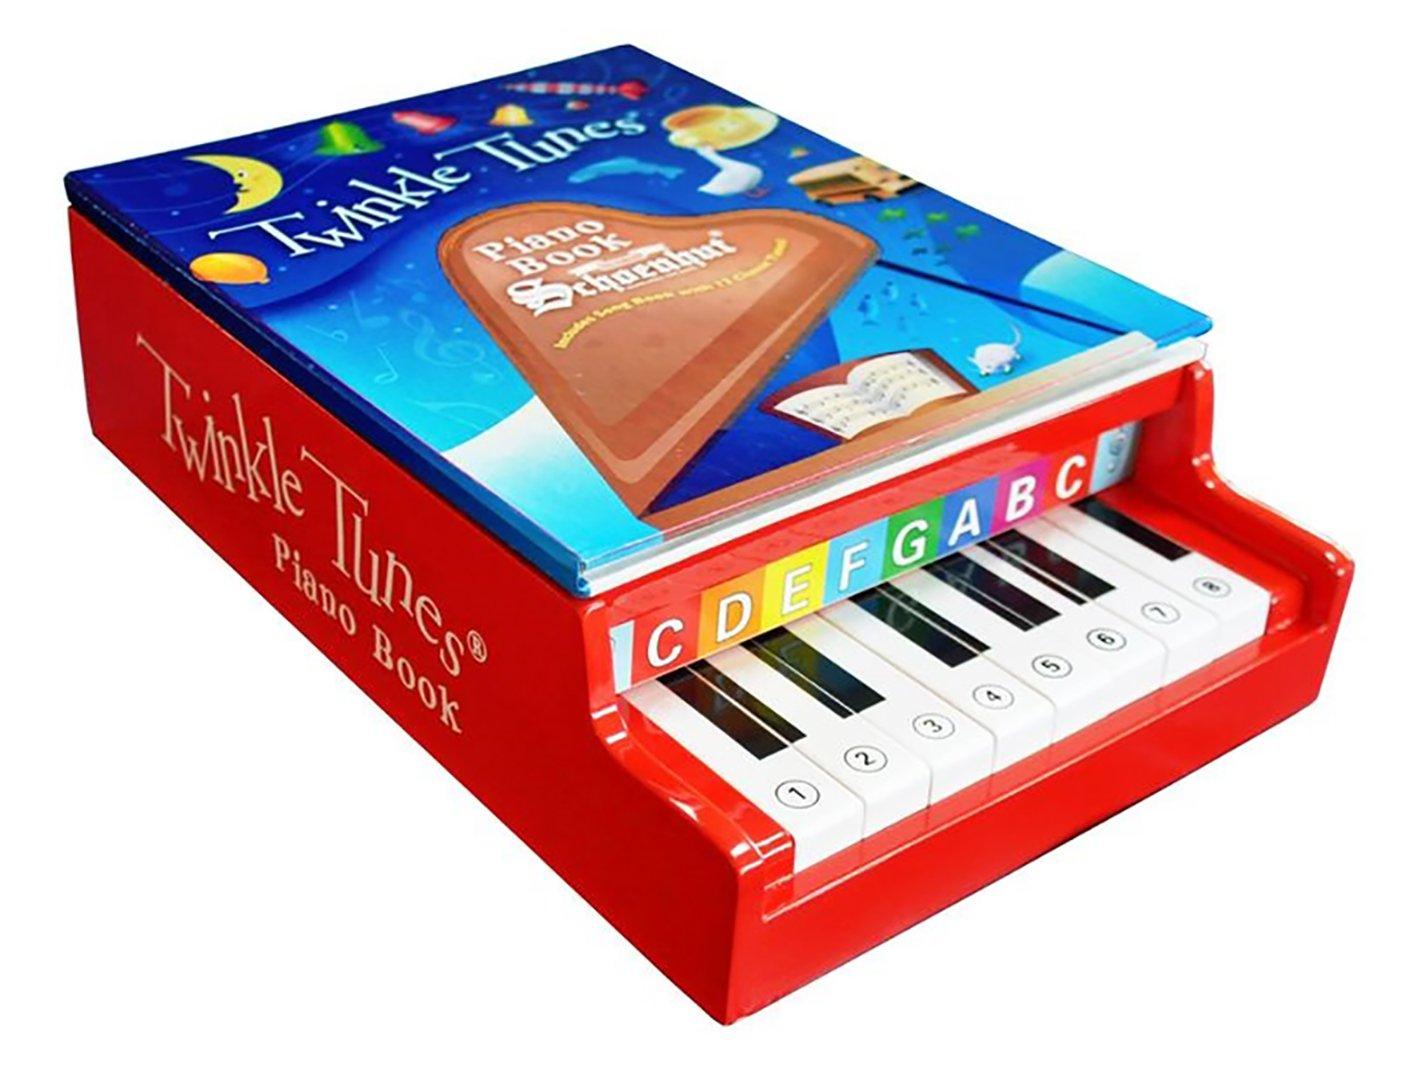 Schoenhut Twinkle Tunes Piano Book (Red) by Schoenhut (English Manual)